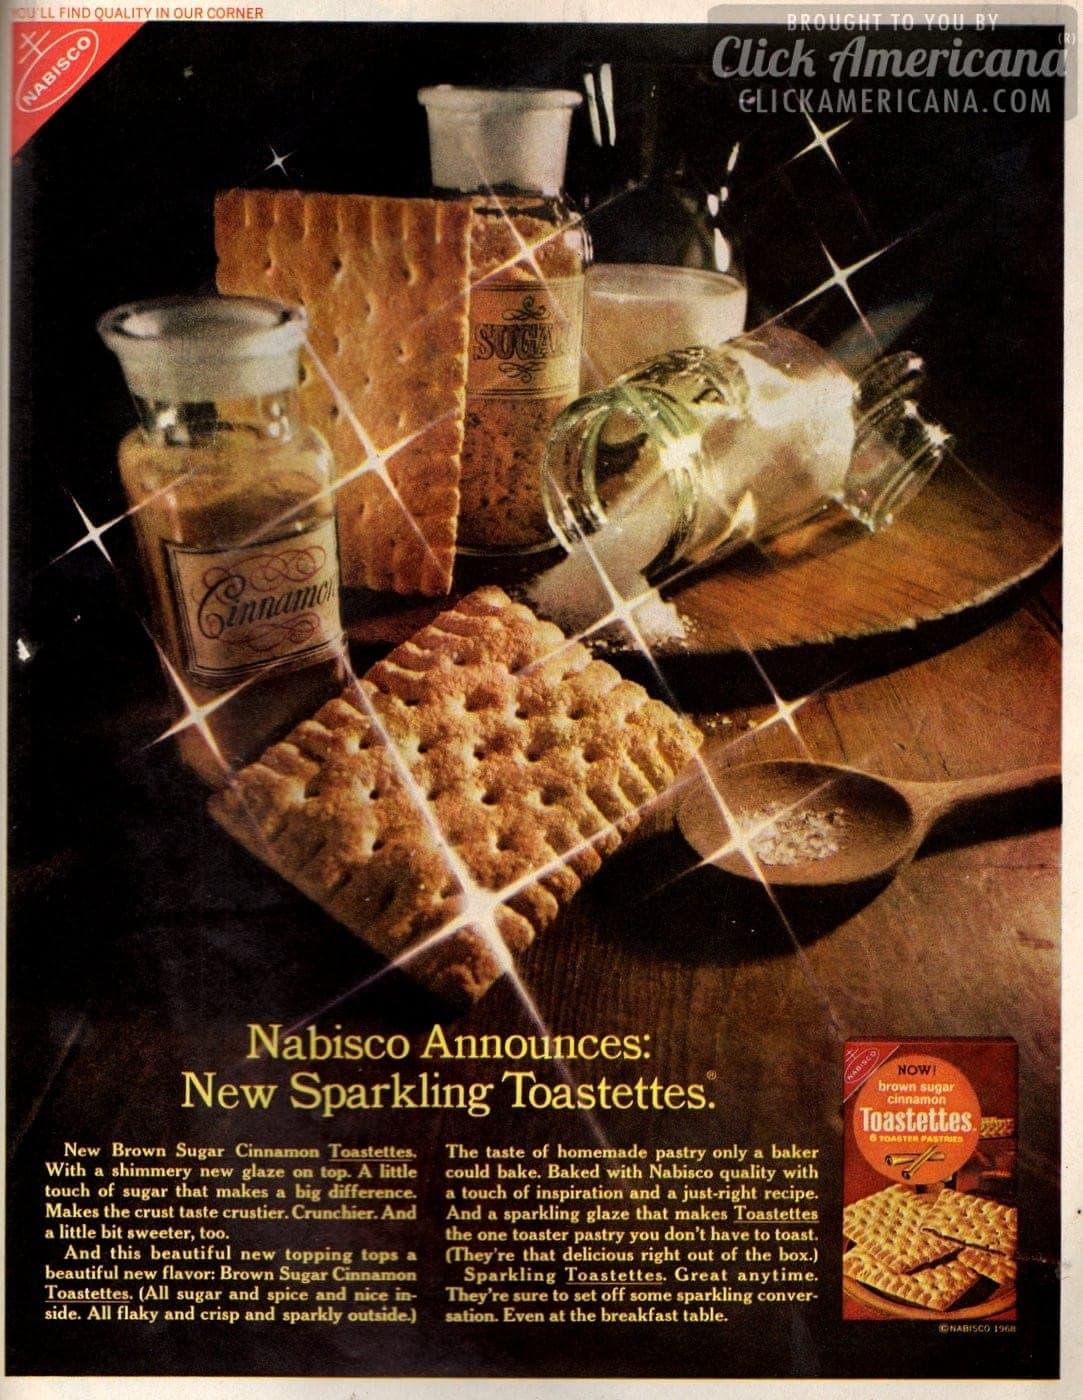 New Brown Sugar Cinnamon Toastettes crackers (1968)